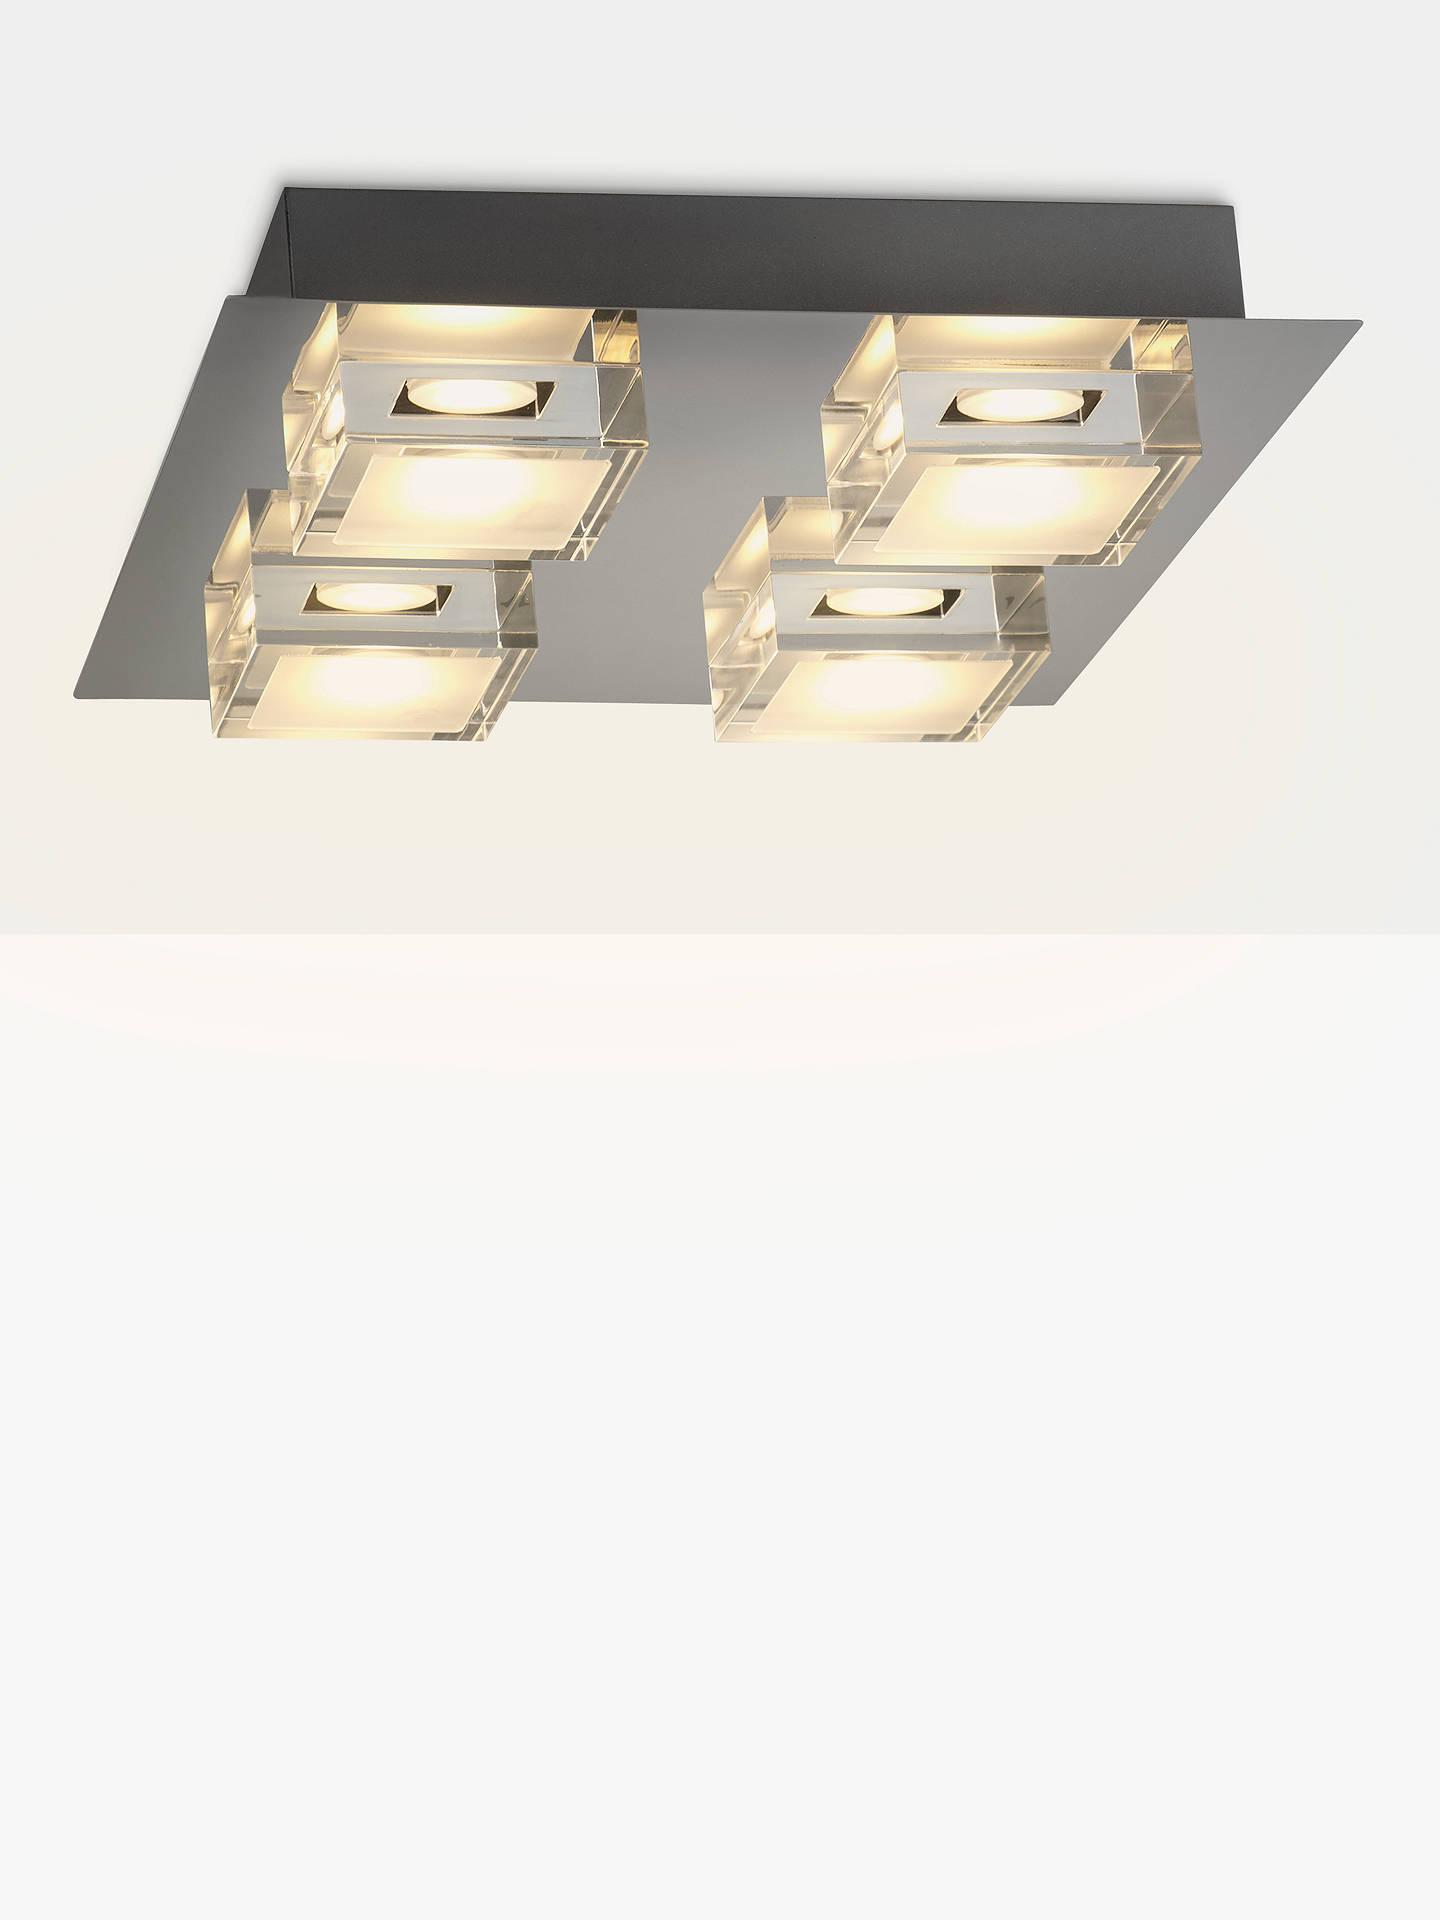 buyjohn lewis partners arlo led bathroom ceiling light chrome online at johnlewis - Led Bathroom Ceiling Lights